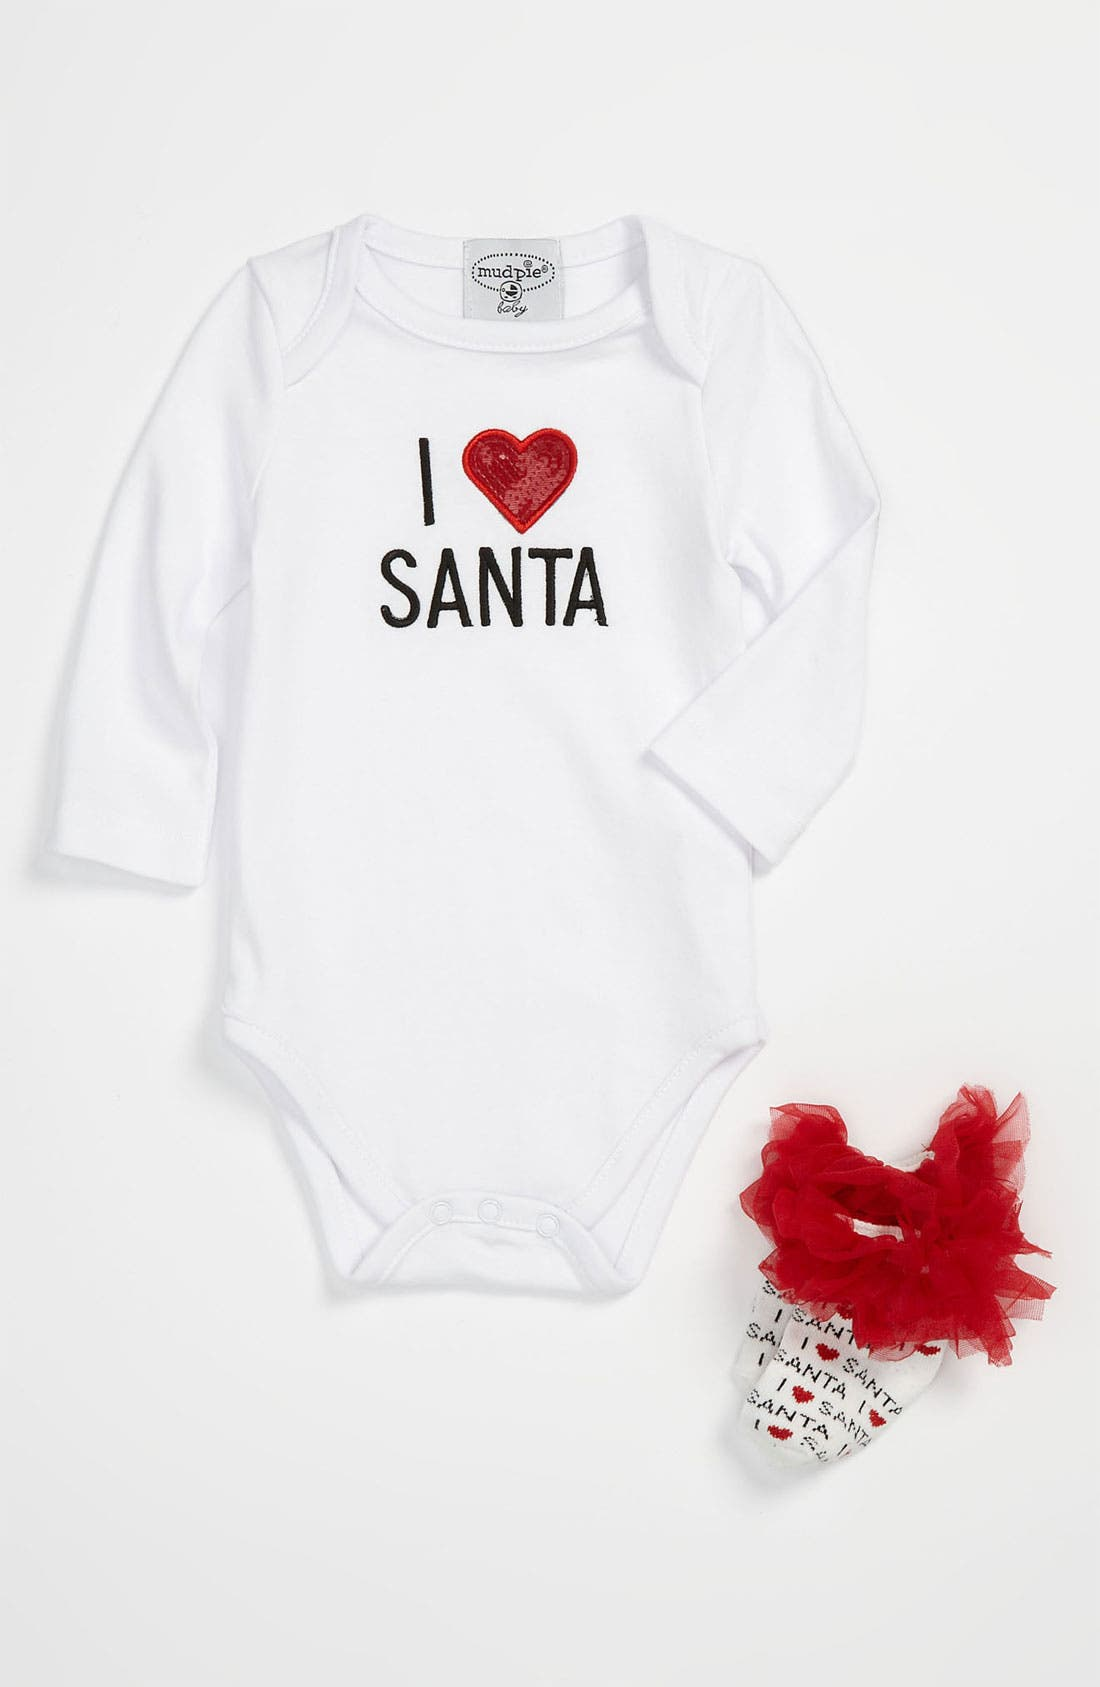 Alternate Image 1 Selected - Mud Pie 'I Love Santa' Gift Set (Infant)